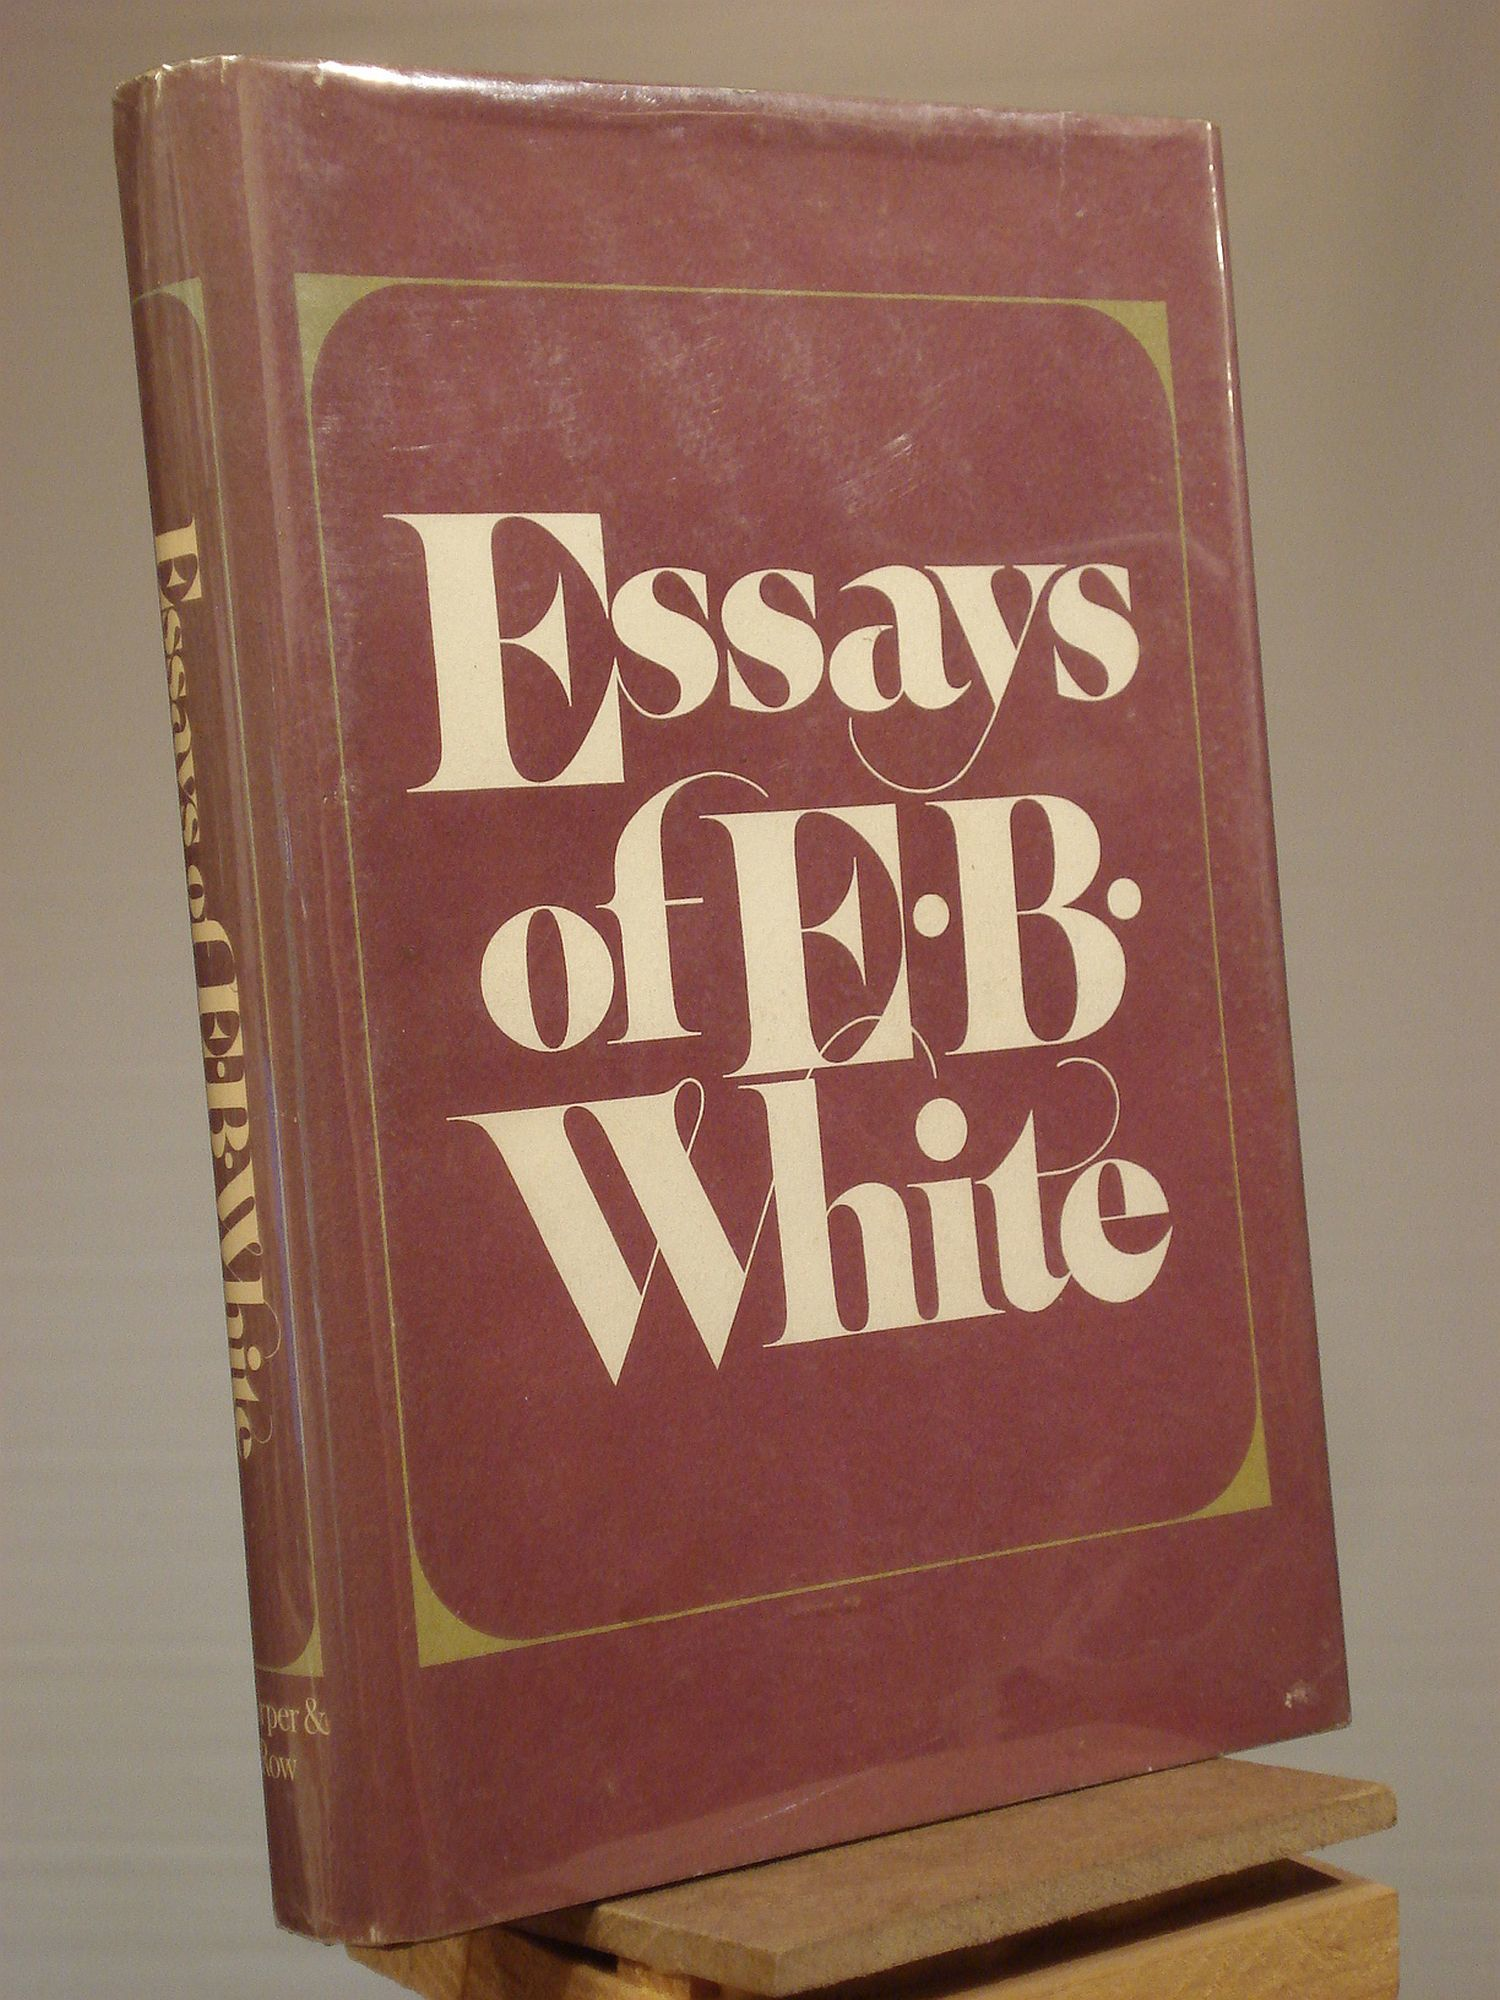 007 X White Essays Essay Unusual Eb Education Summary Online Pdf Full